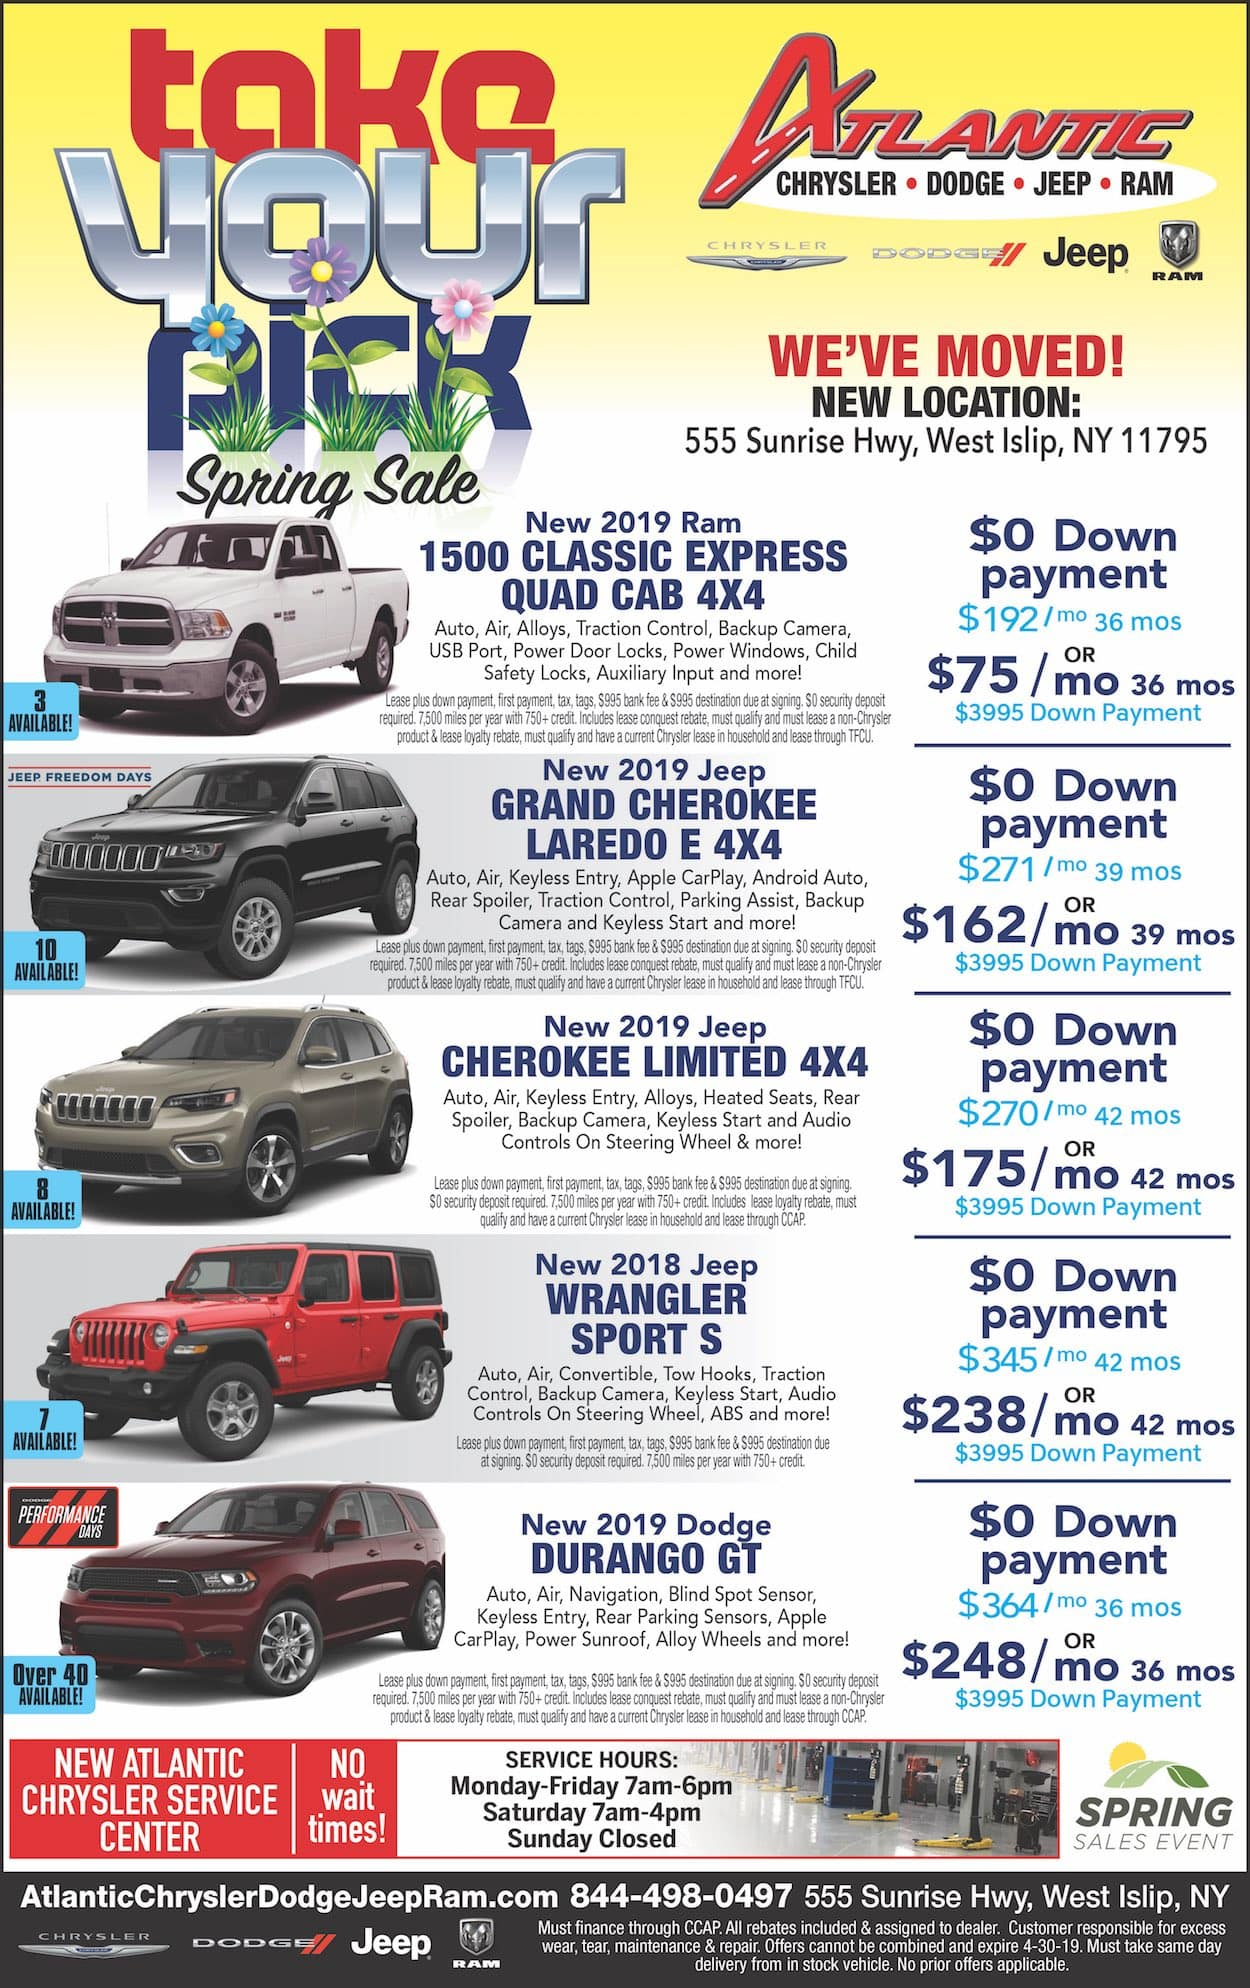 Atlantic Chrysler Dodge Jeep Ram - Shop Our Ad!